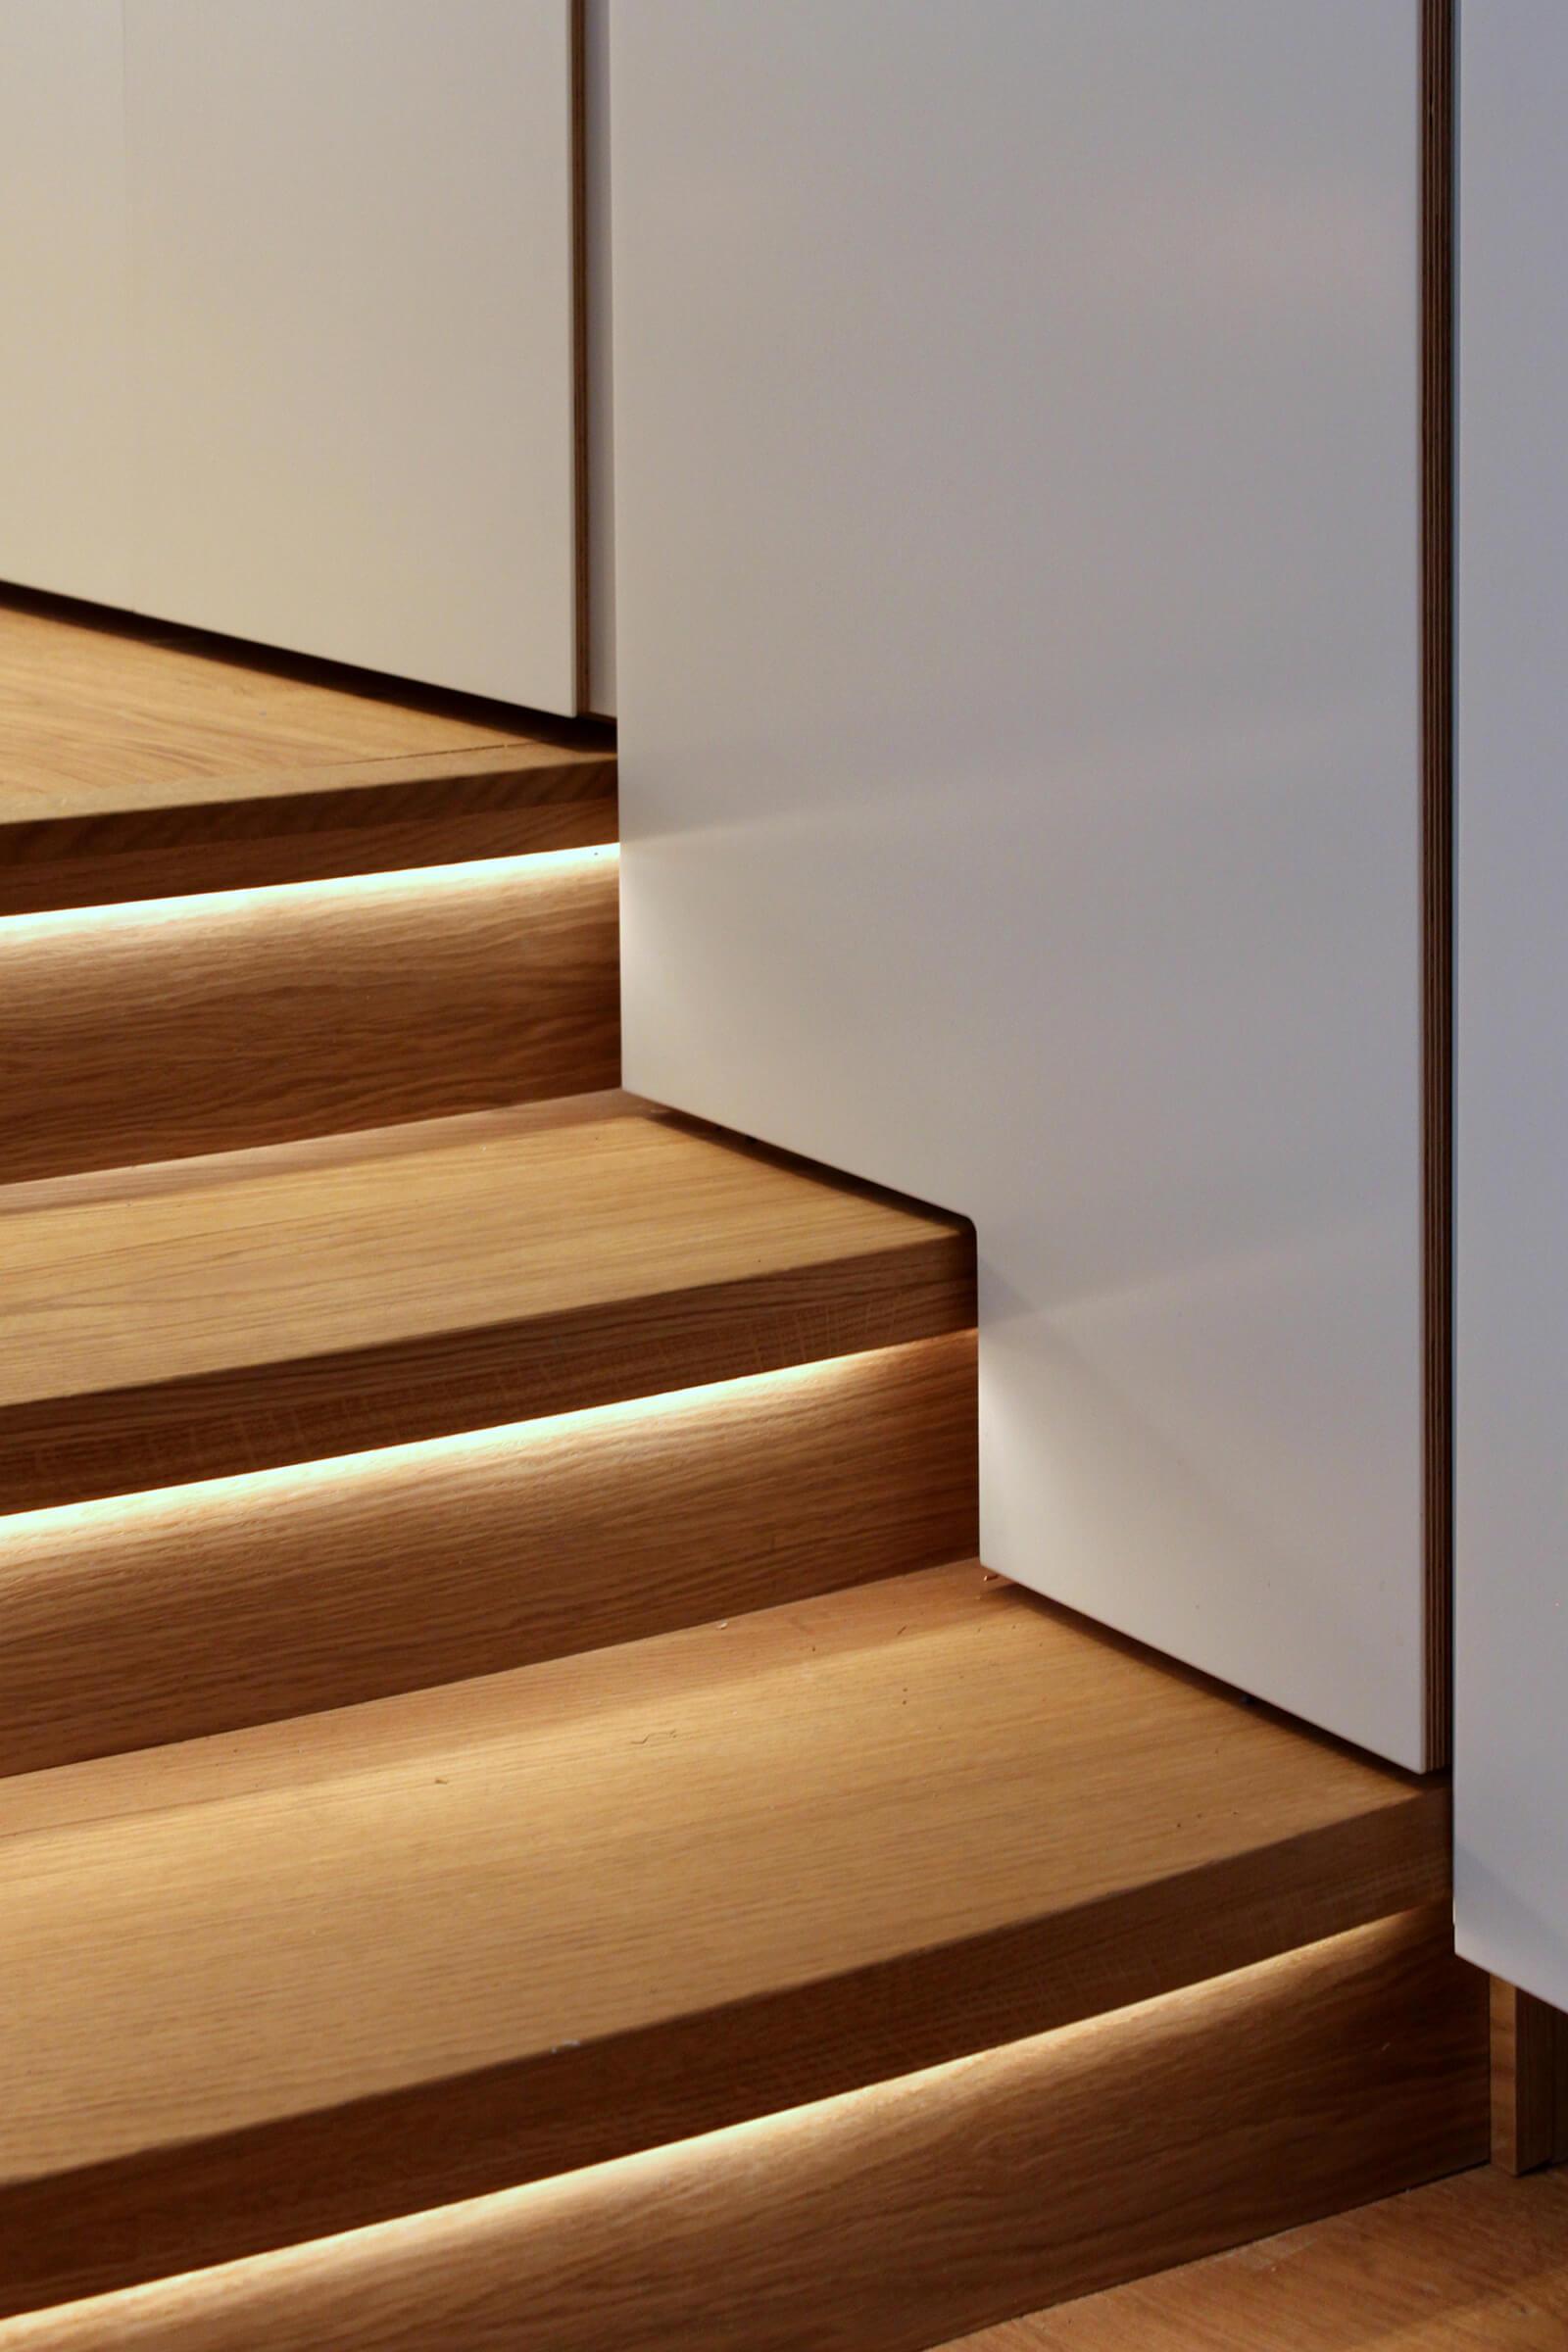 Creative design on steps in this modern split level kitchen